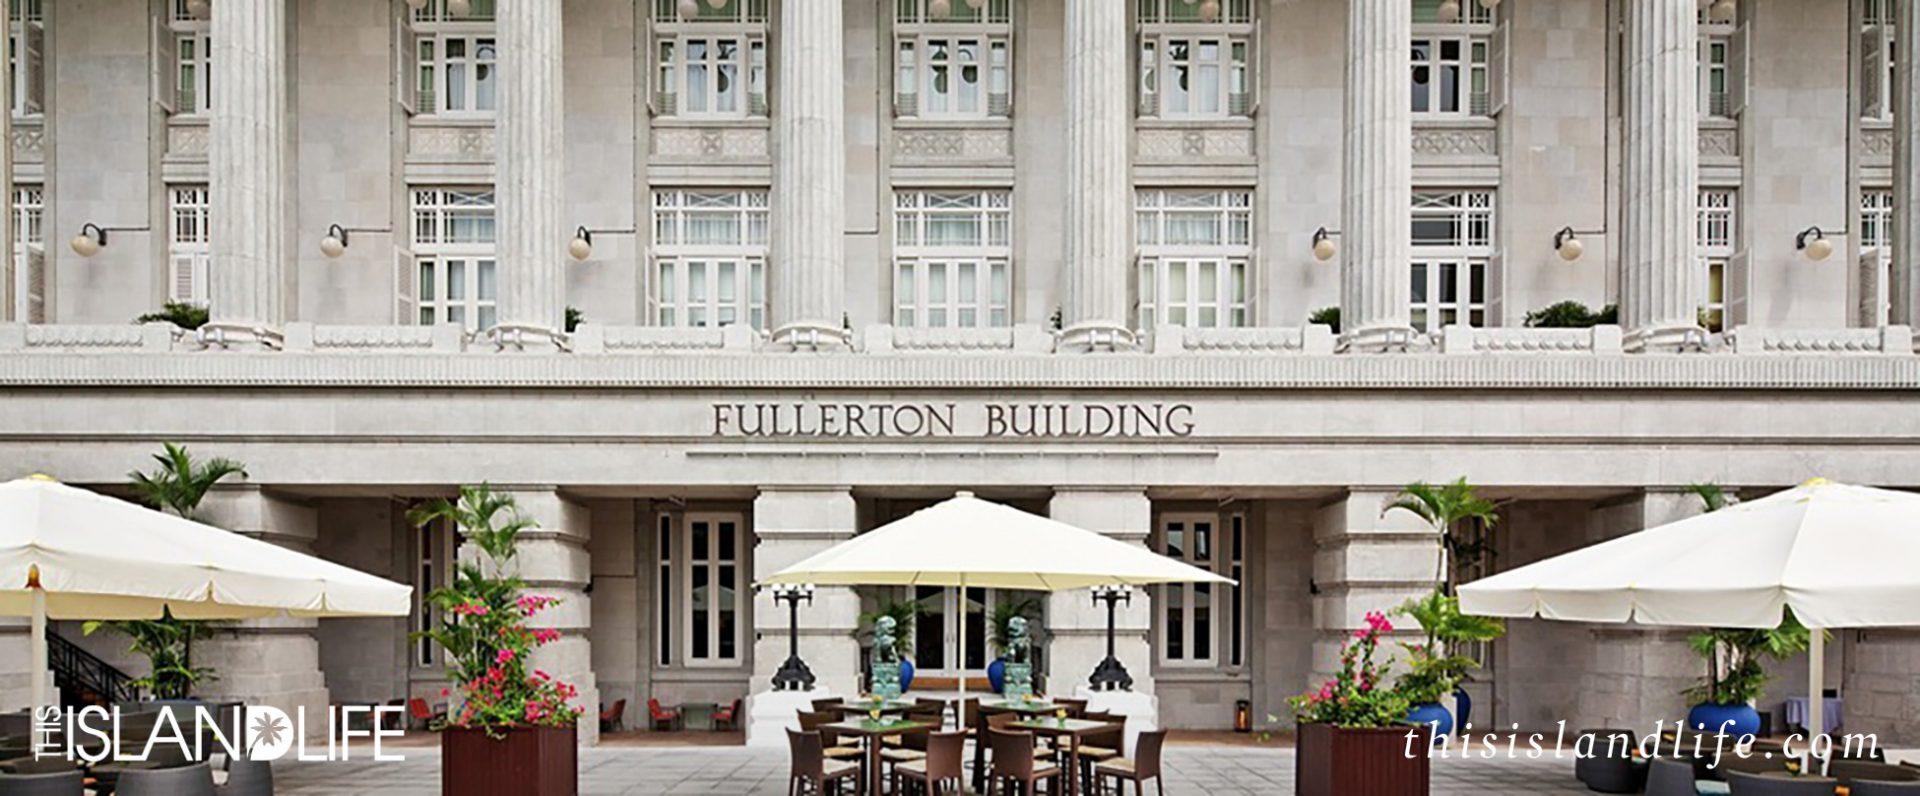 This island life the fullerton hotel singapore